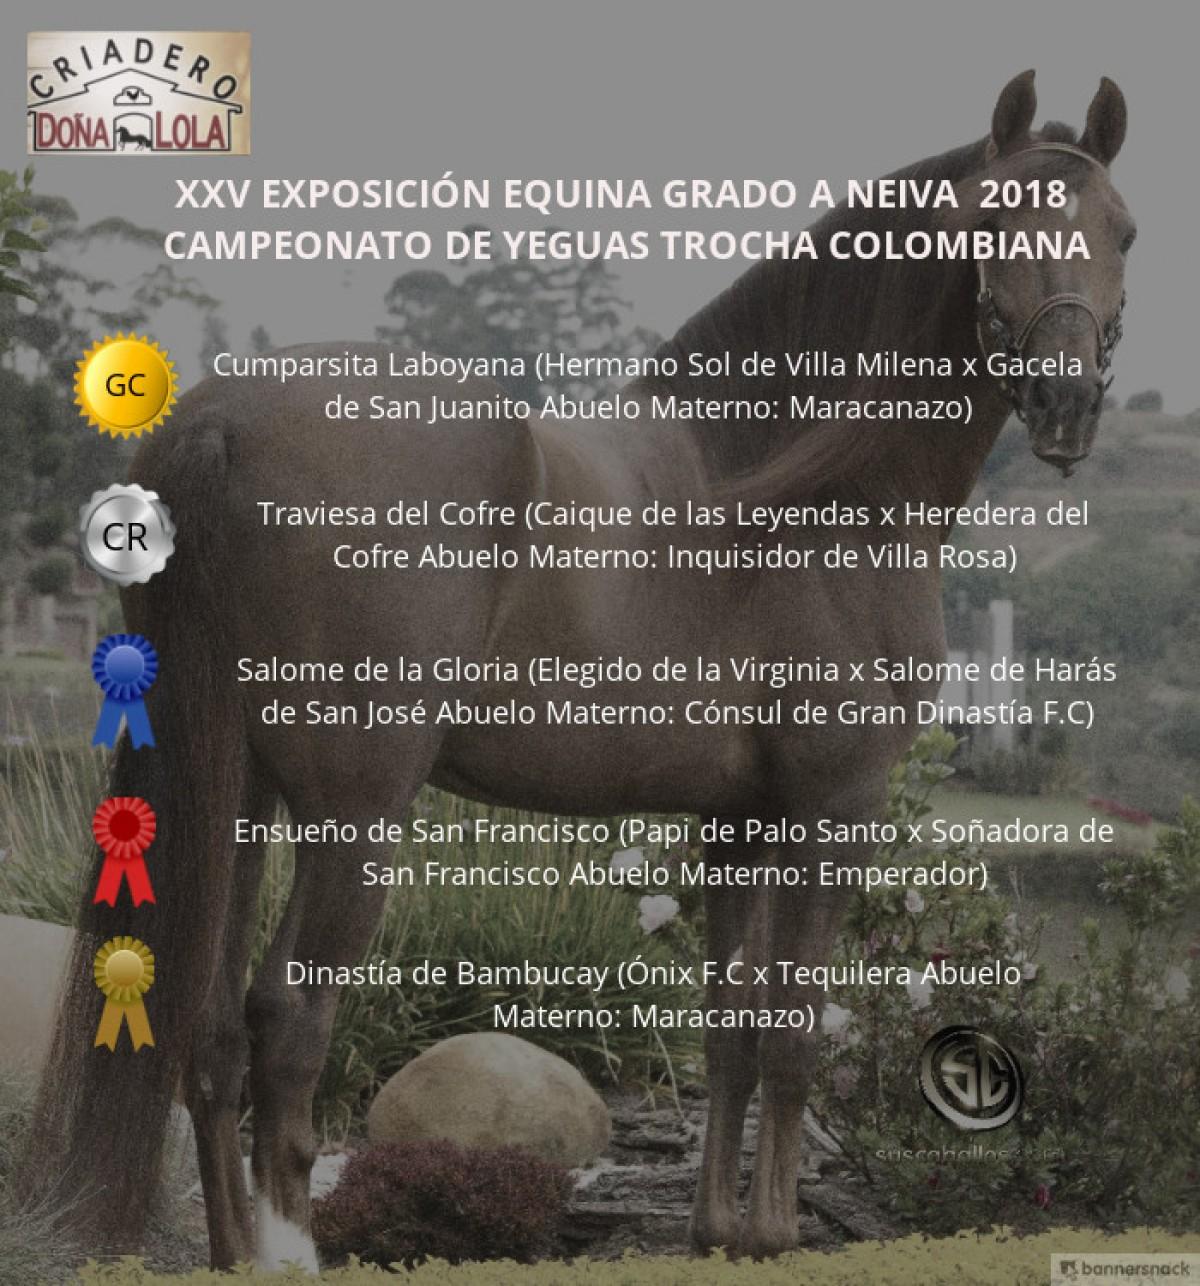 VÍDEO: Cumparsita Campeona, Traviesa Reservada, Trocha Colombiana, Neiva 2018